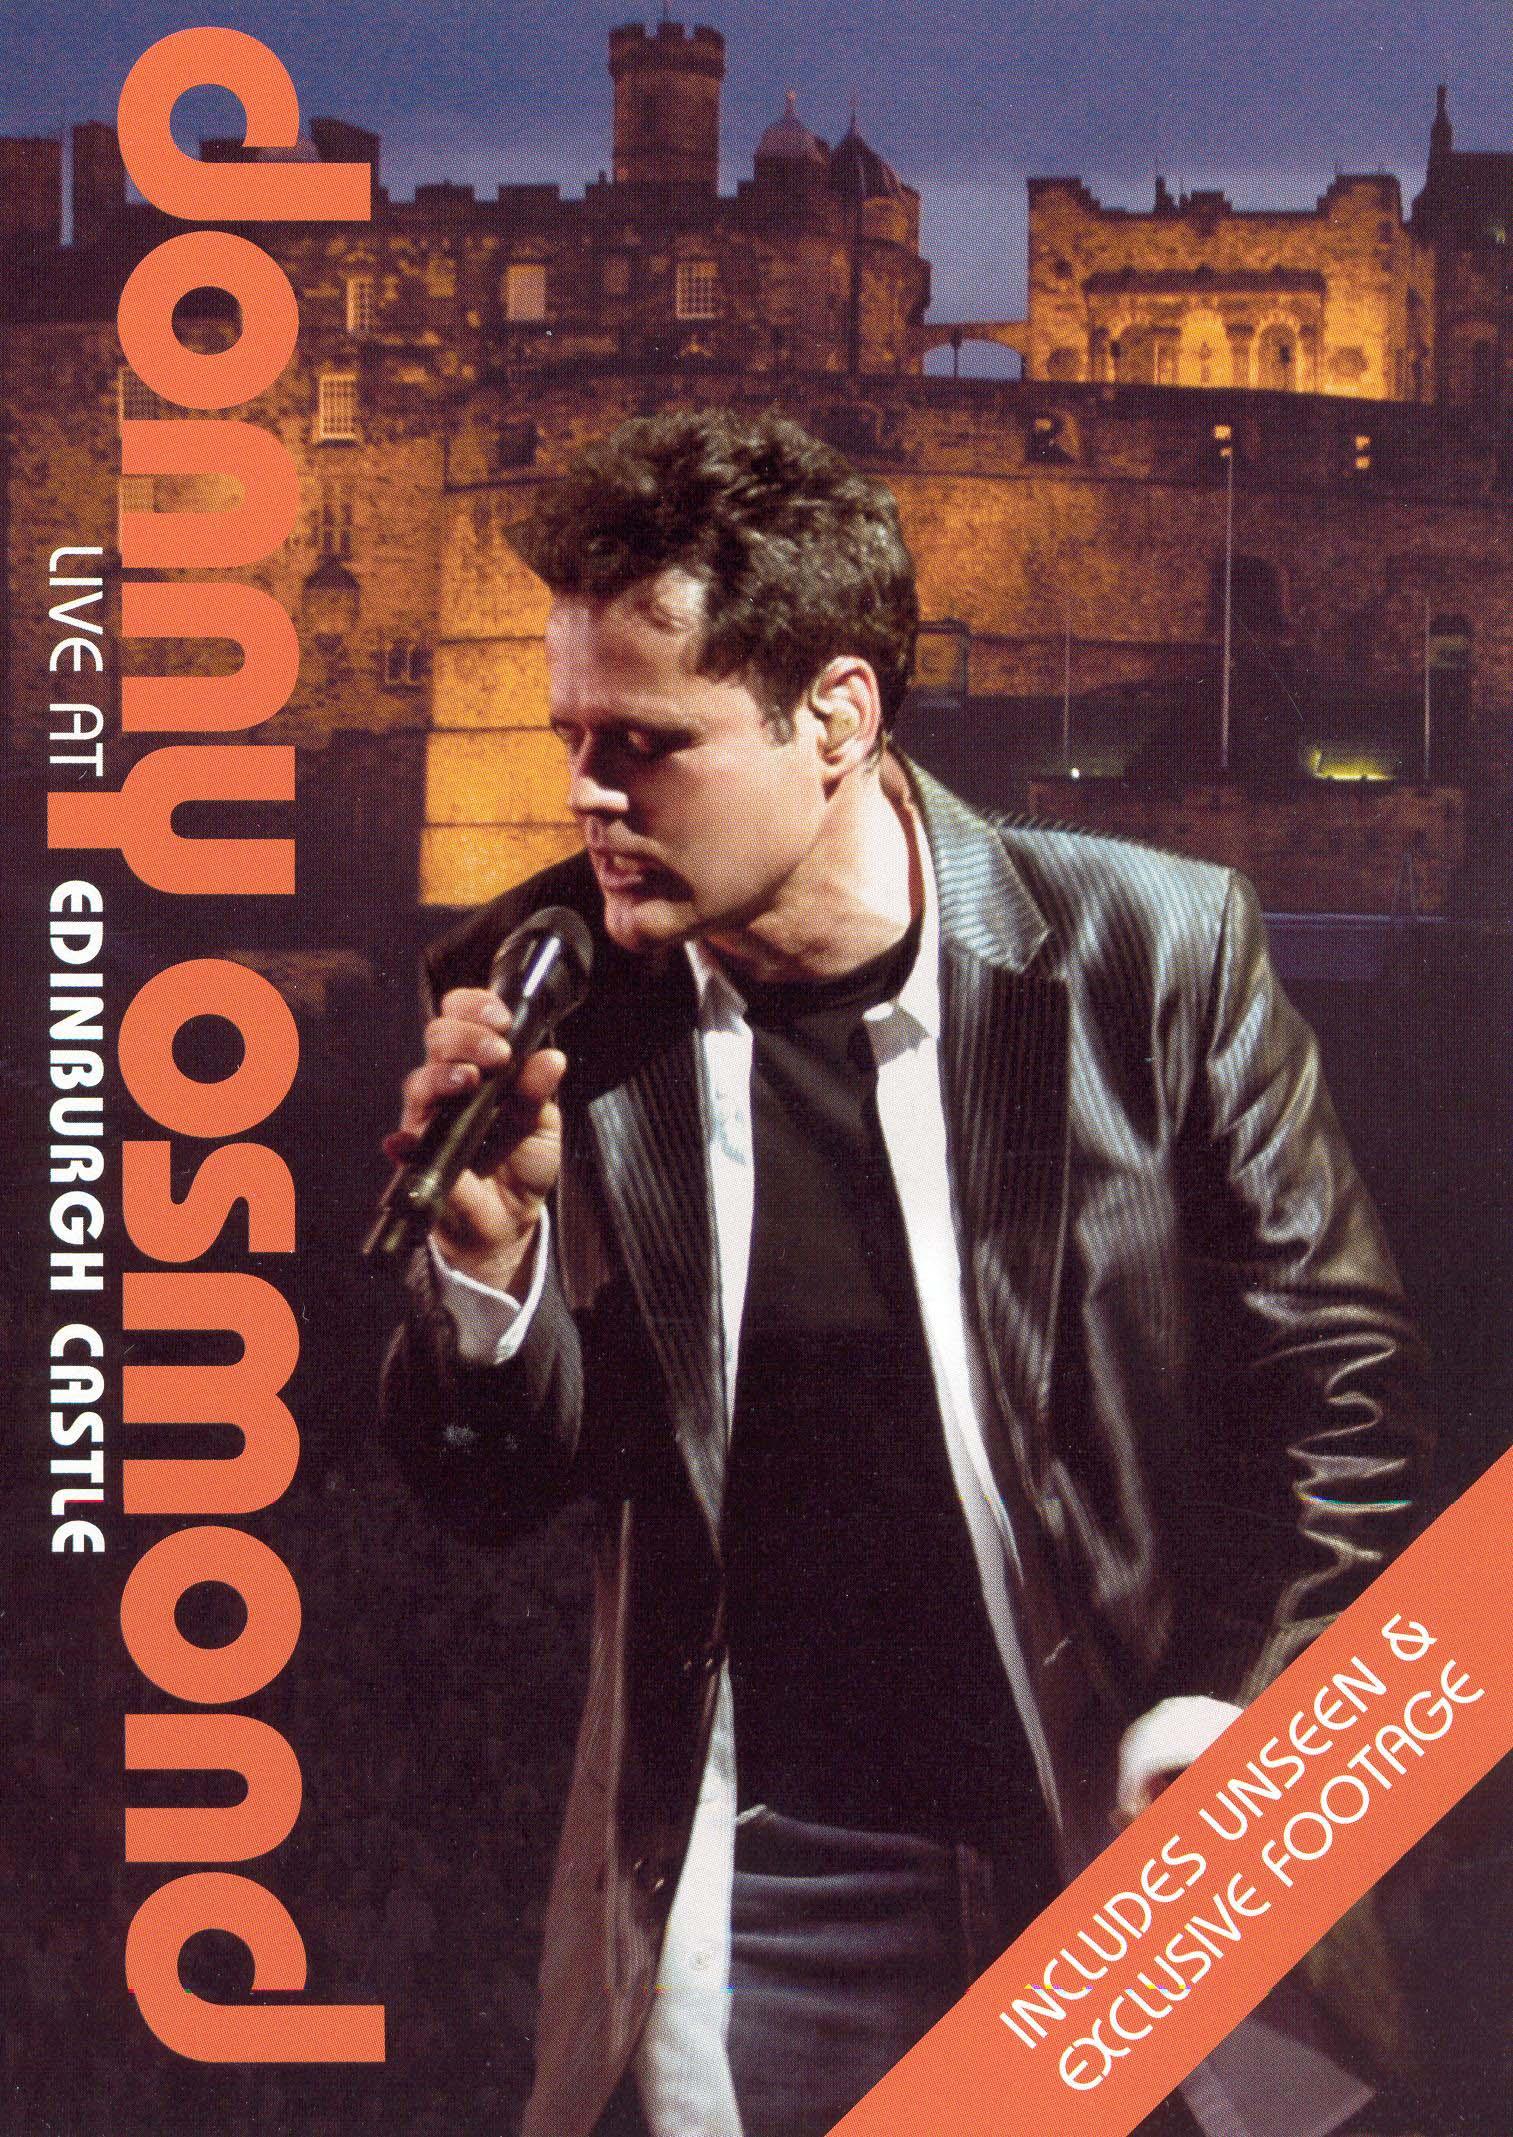 Donny Osmond: Live at Edinburgh Castle